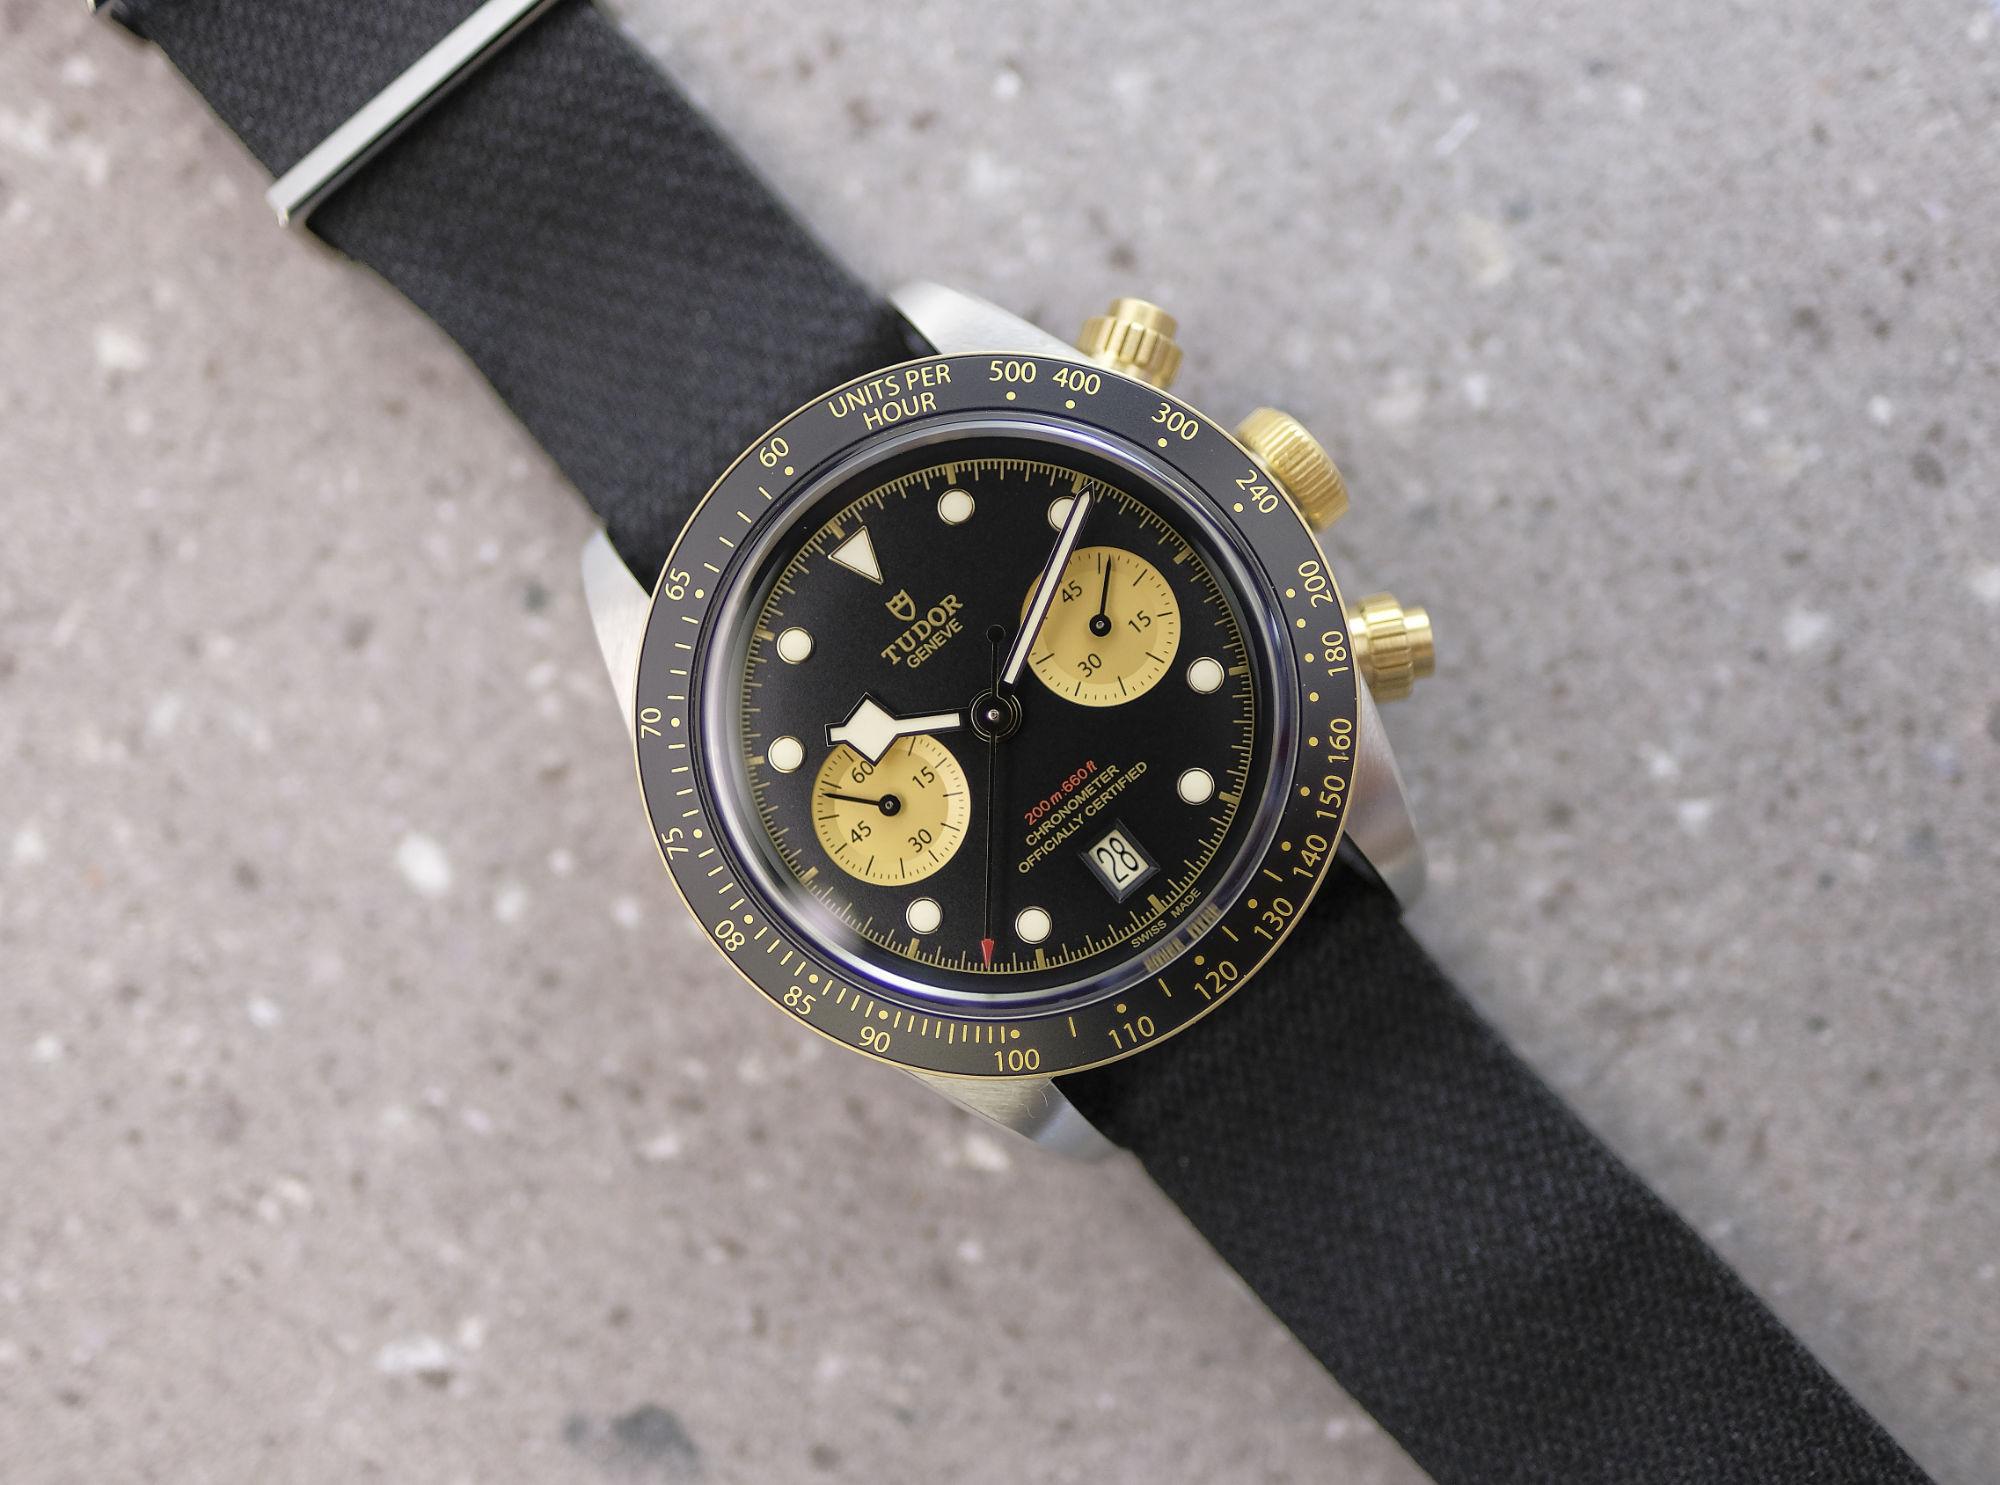 cfea5cbcbda Tudor's Black Bay Chrono in S&G - The Hour Glass